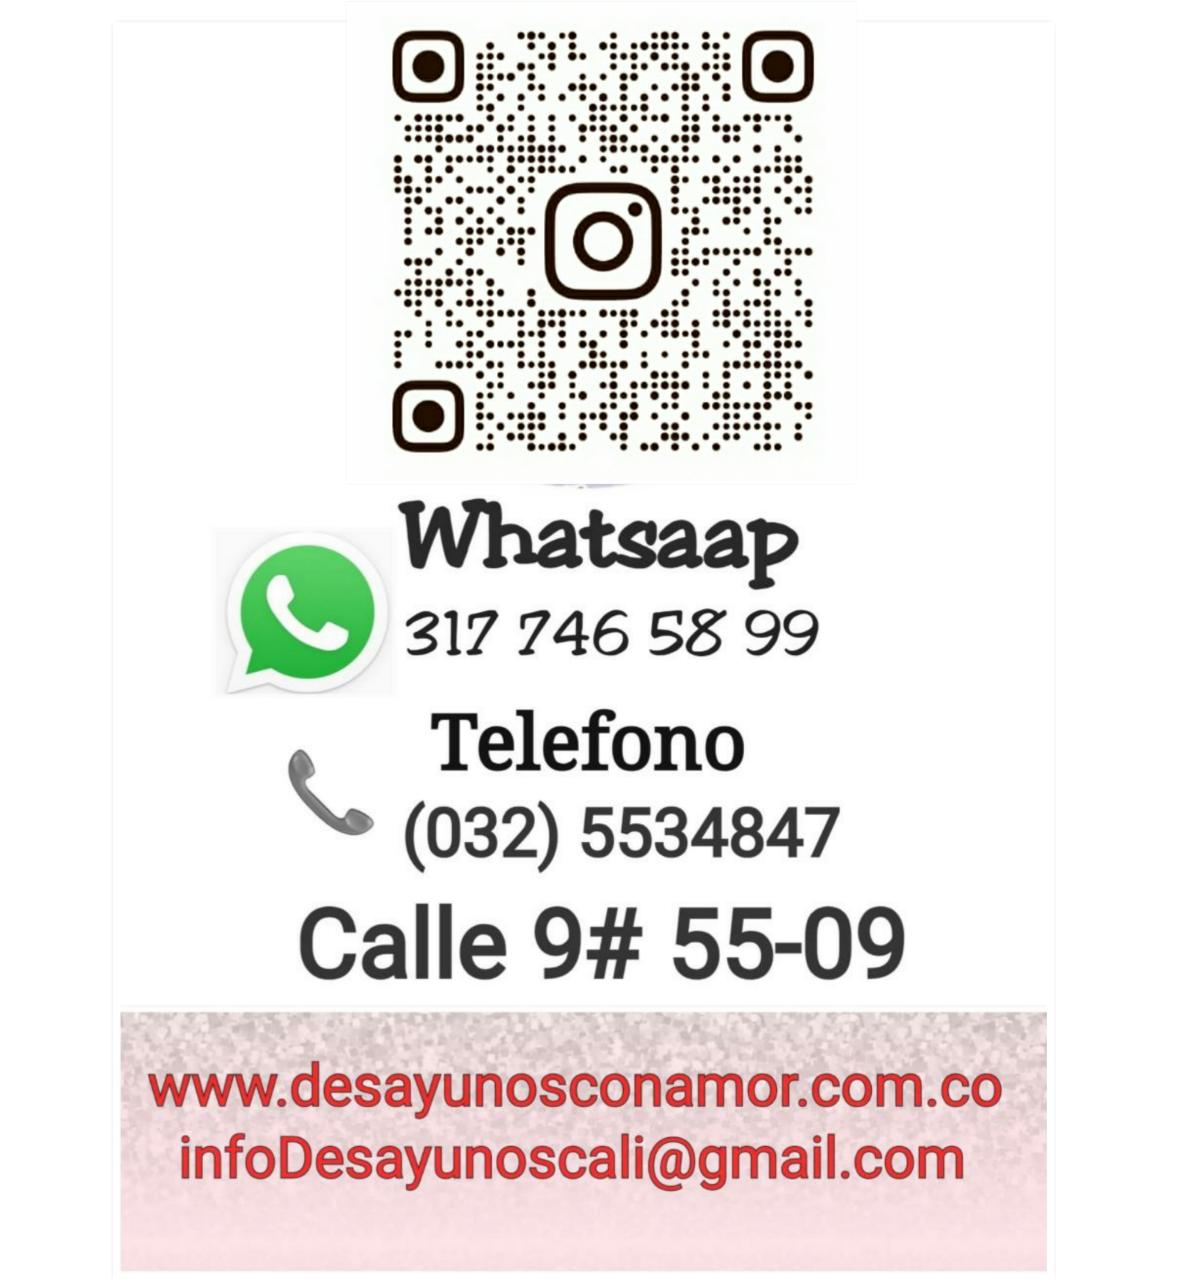 WhatsApp Image 2021-01-04 at 12.17.36 PM